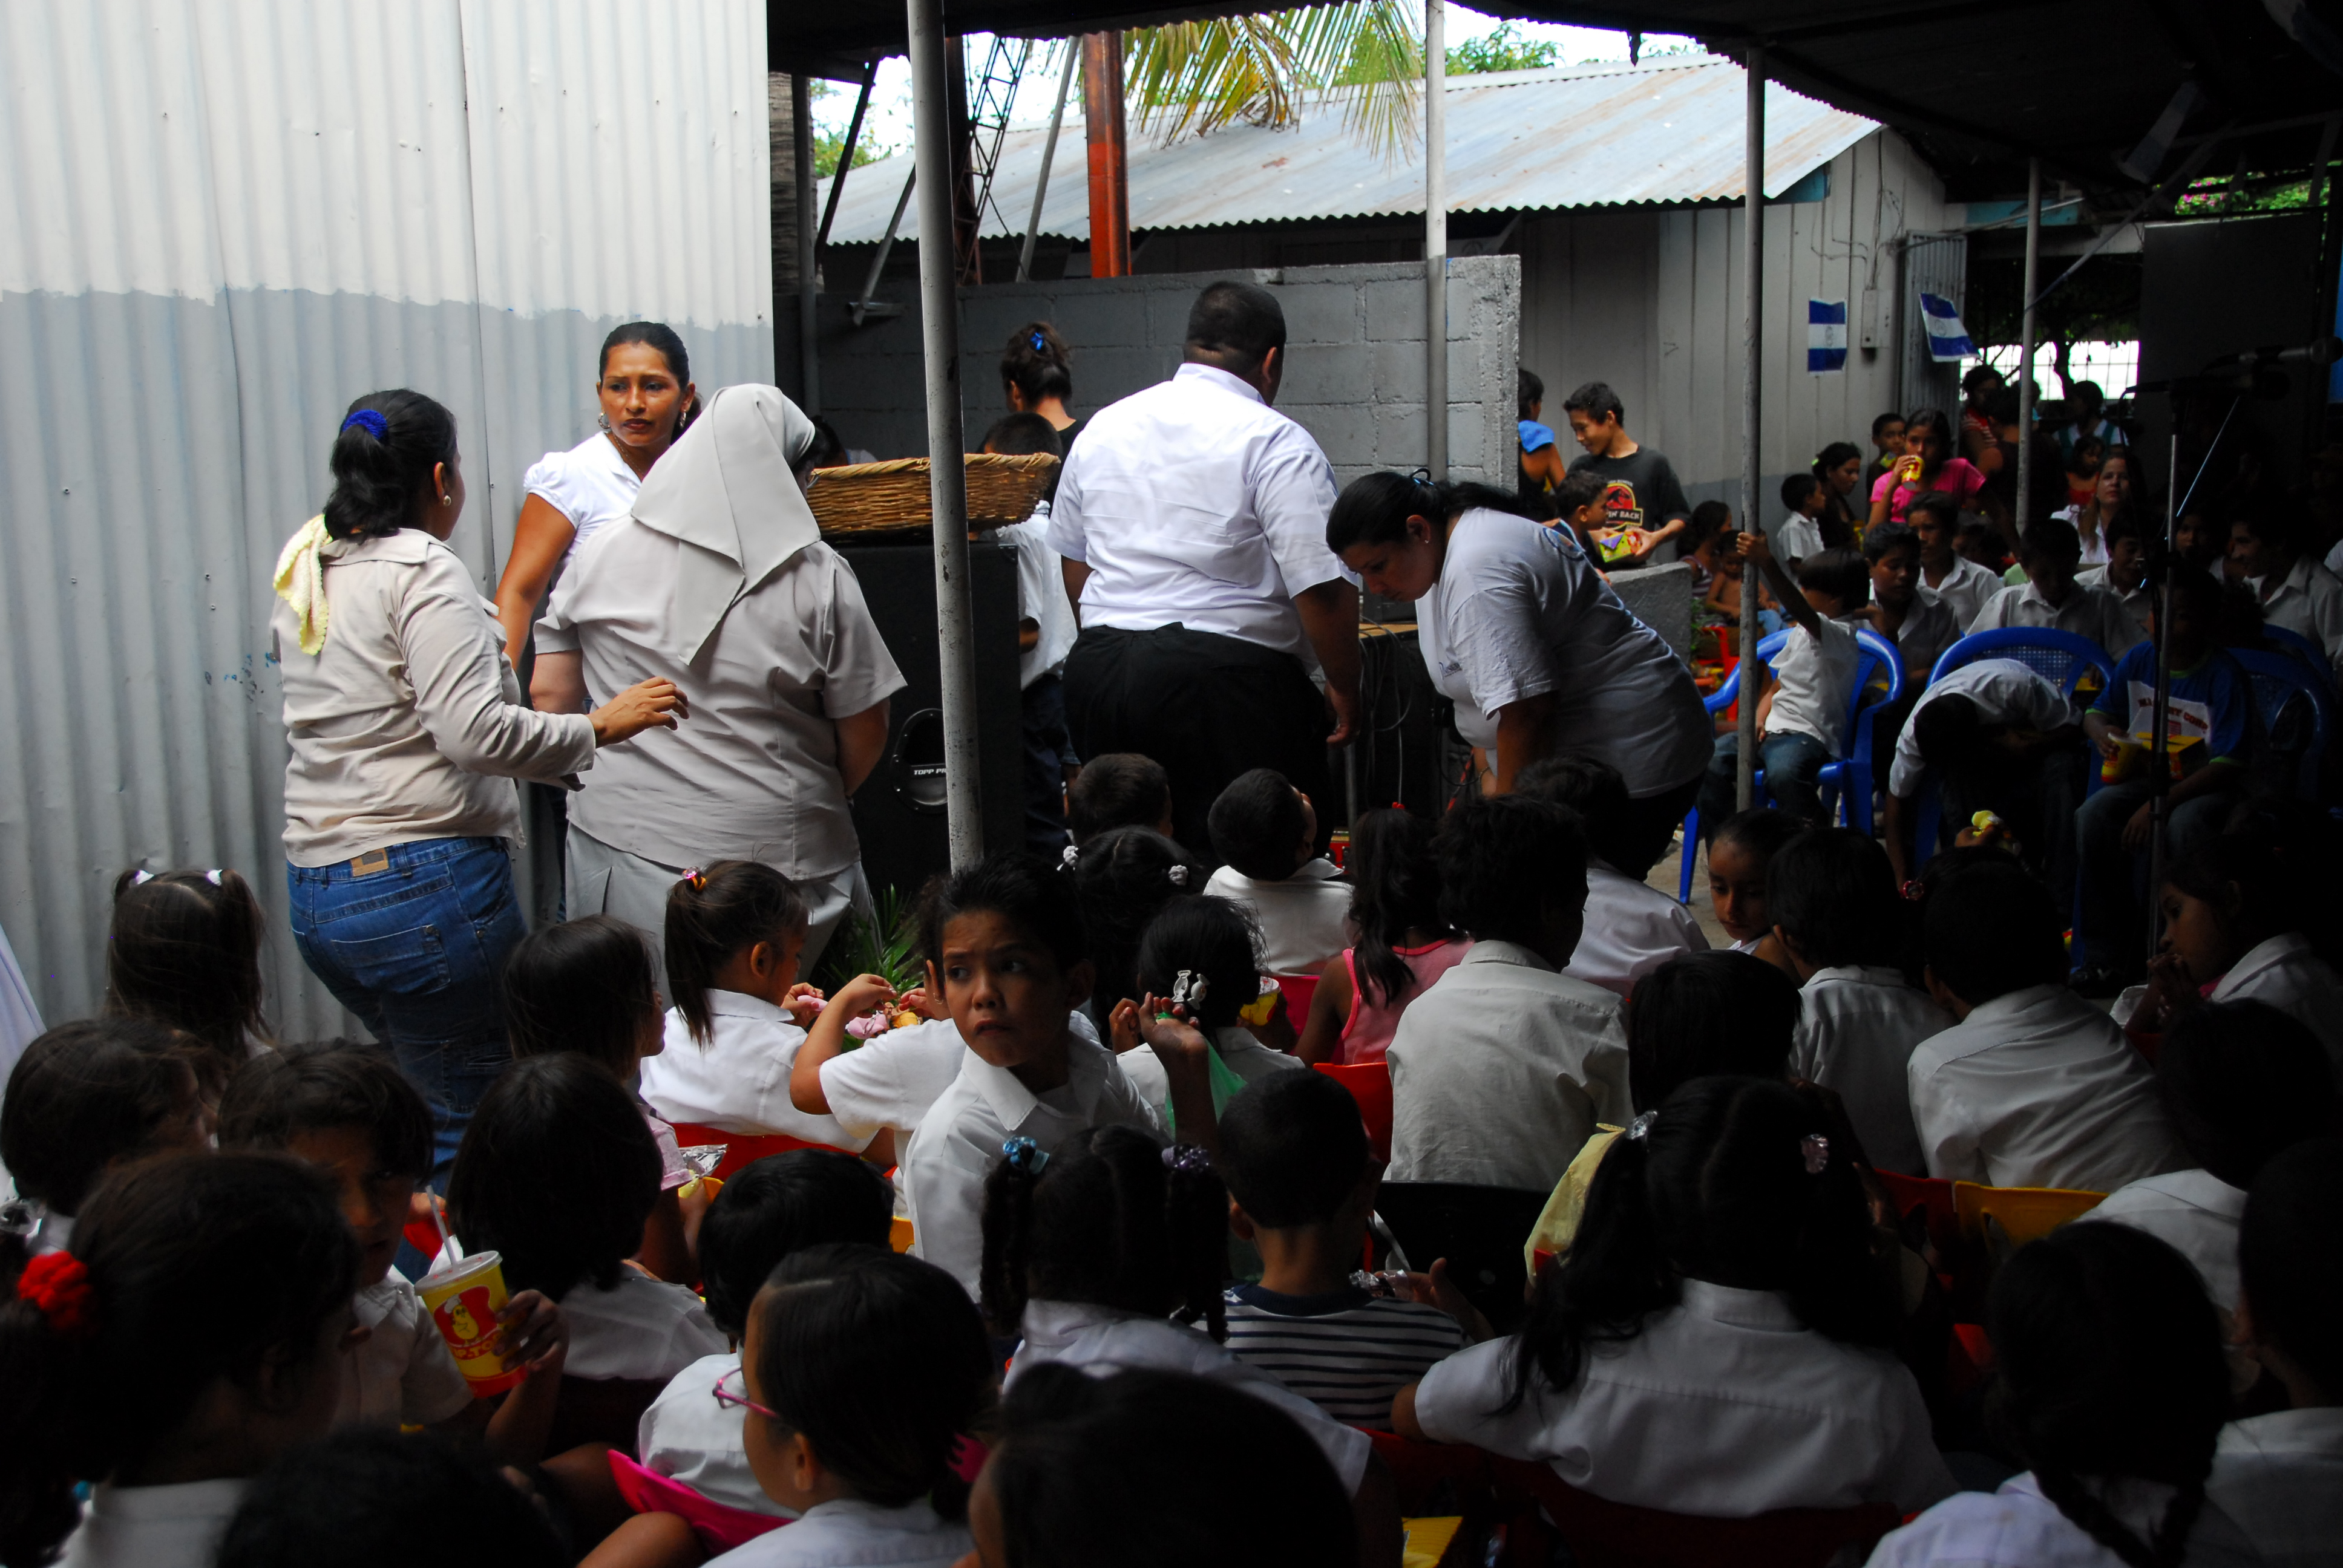 COMEDOR NICARAGUA